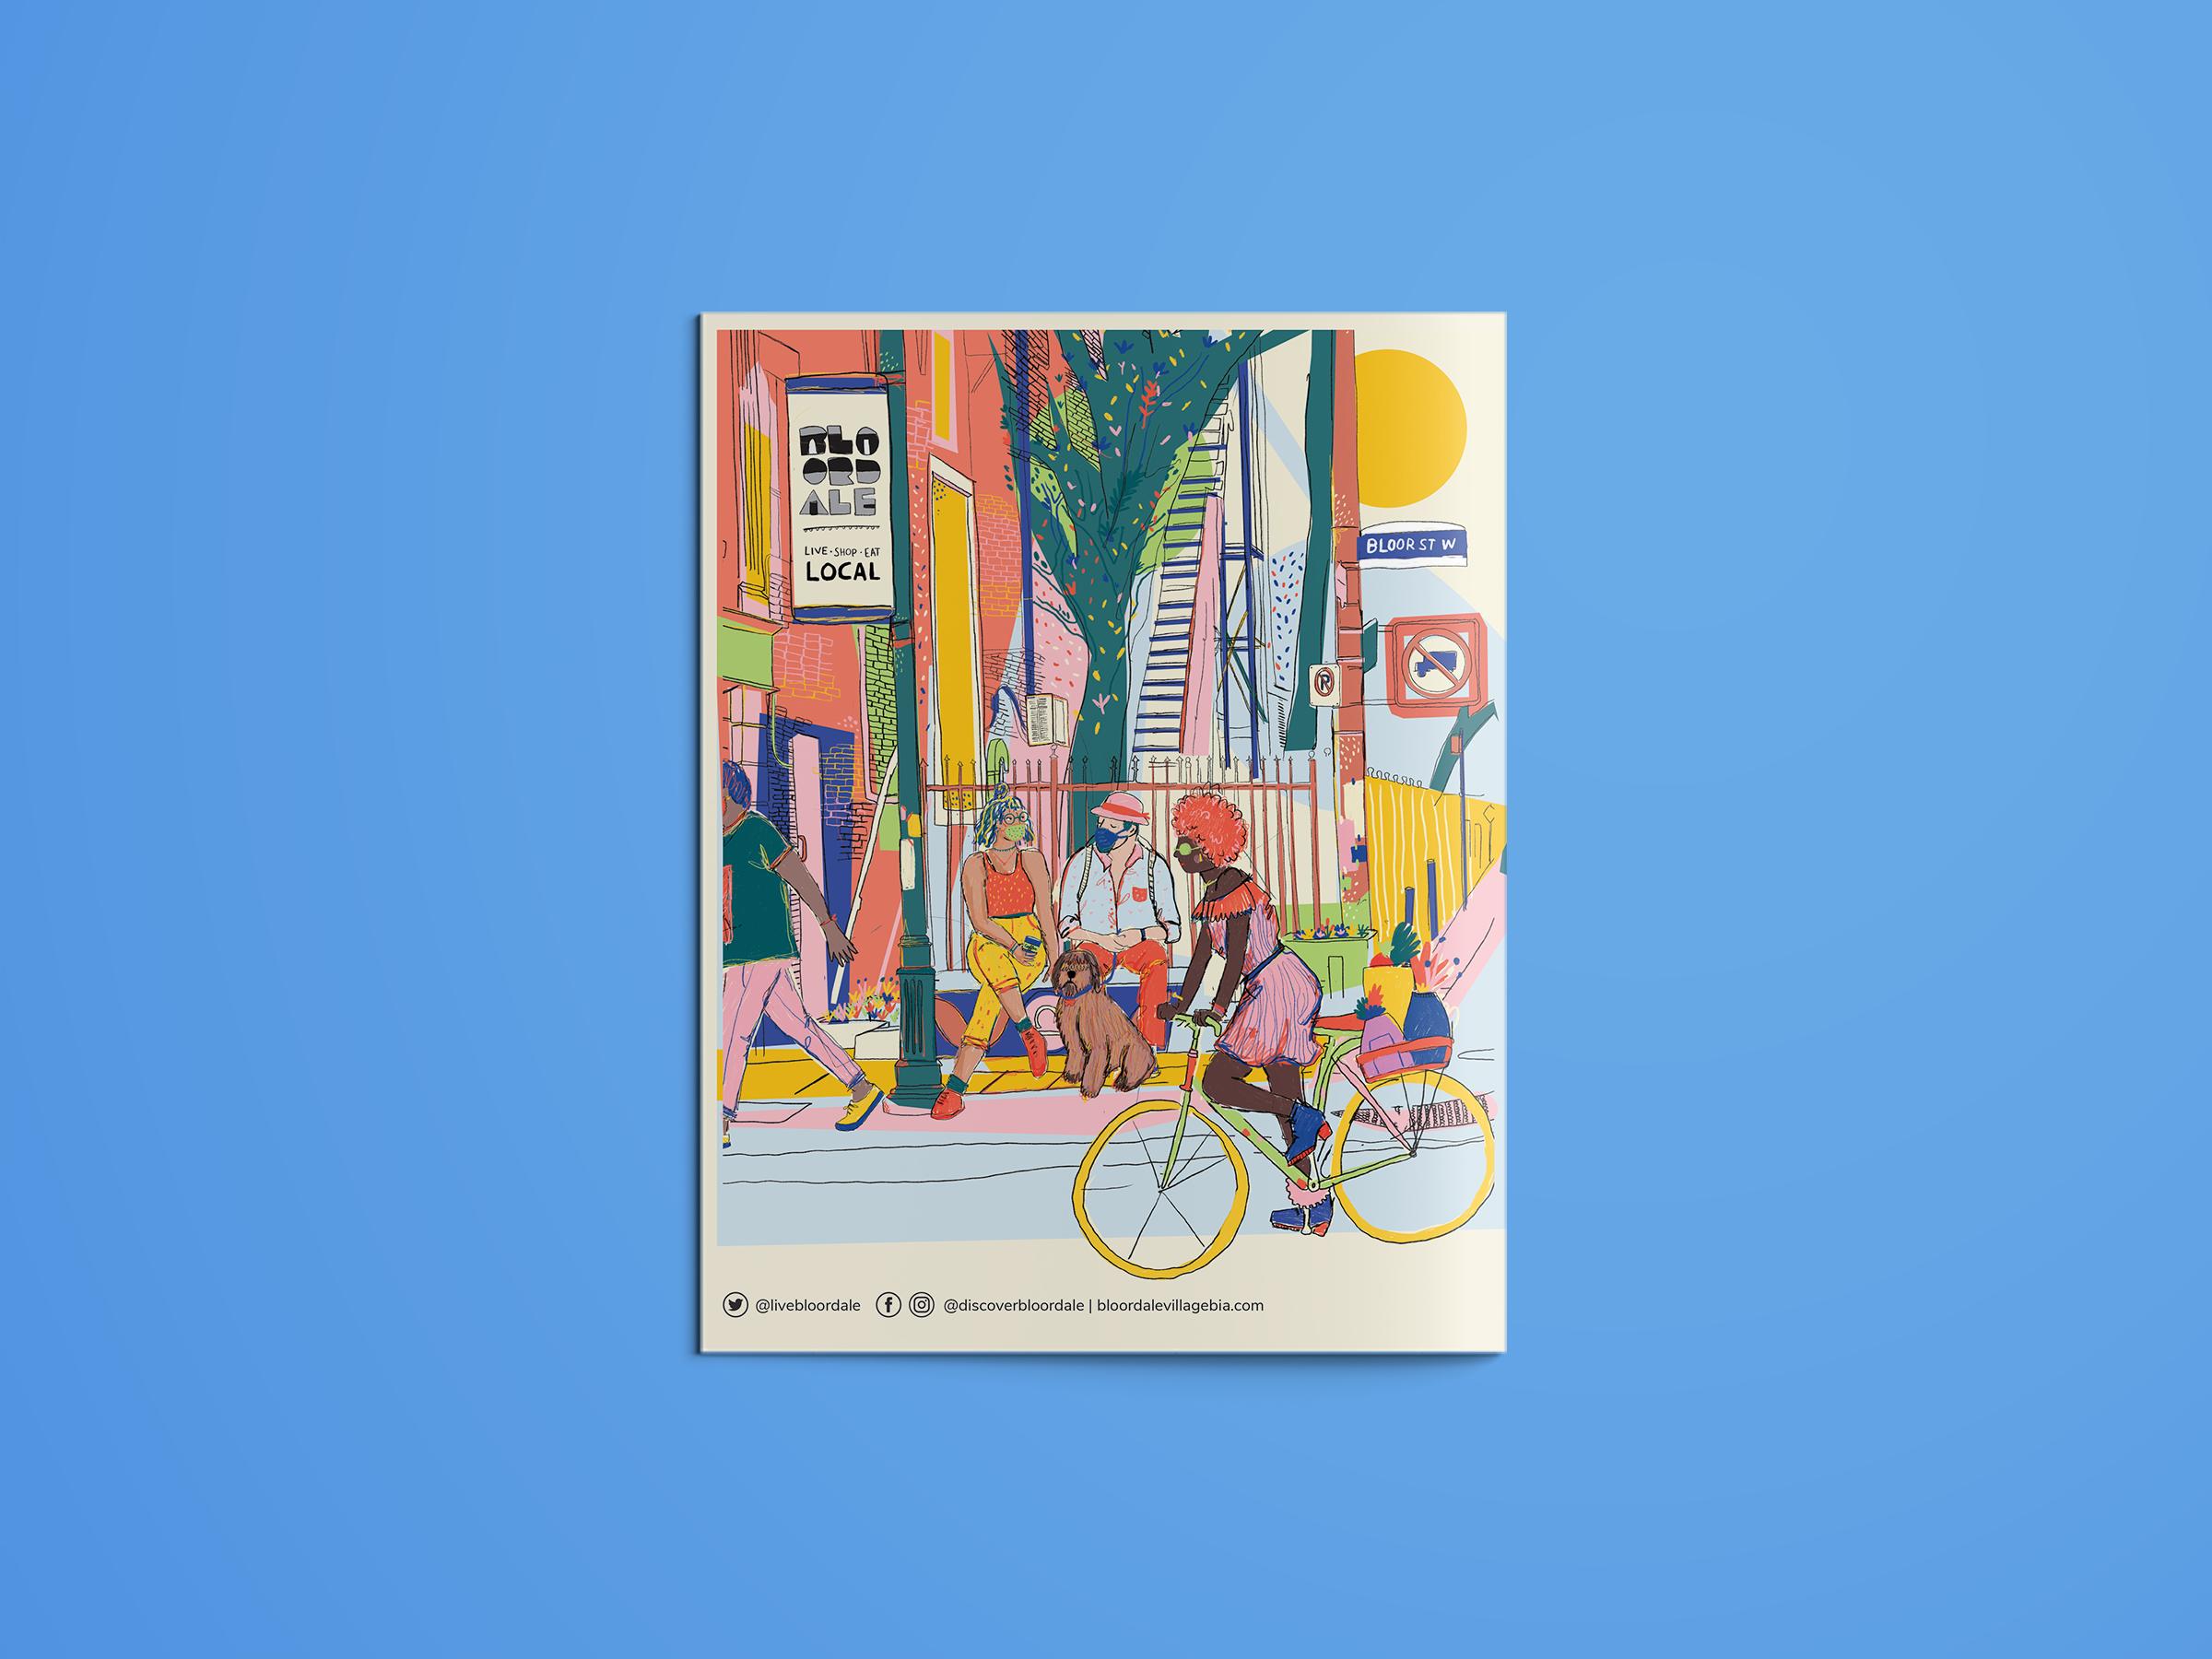 Back of a magazine. A colourful scene f someone biking through a neighbourhood.